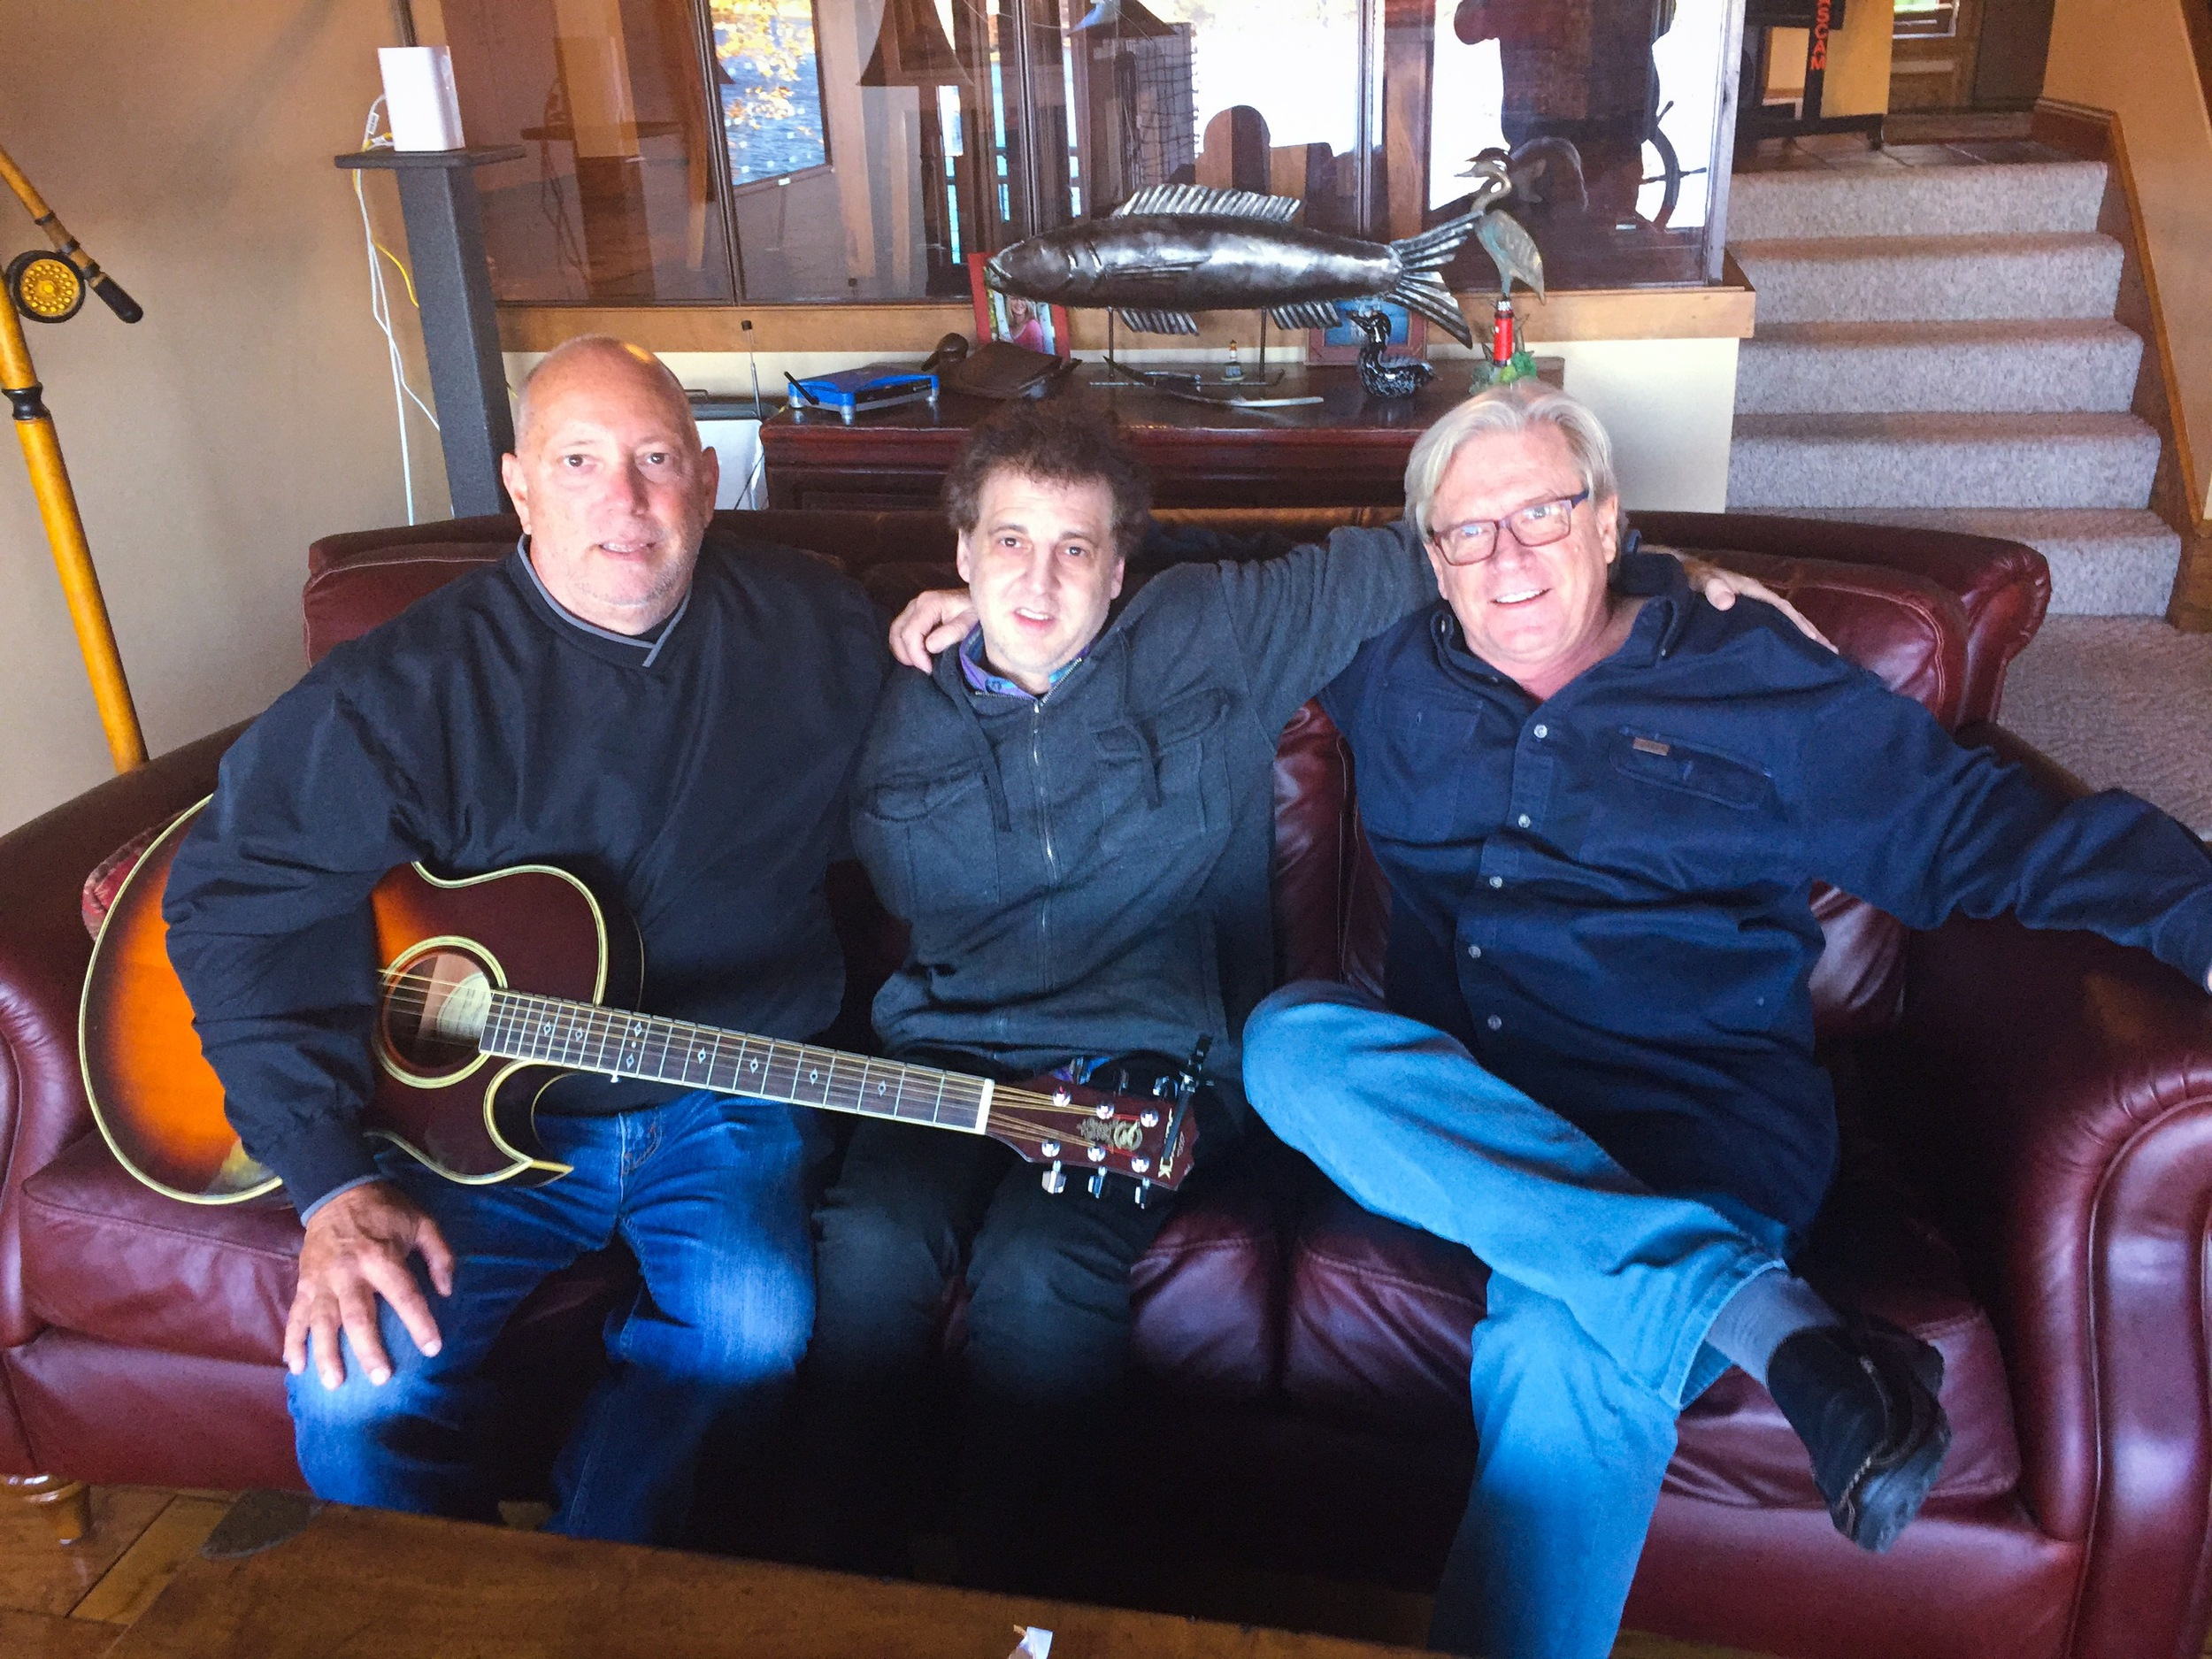 Kenny Krona, Magic Marc and Kevin Odegard / Cambridge, Minnesota / October 15th, 2015